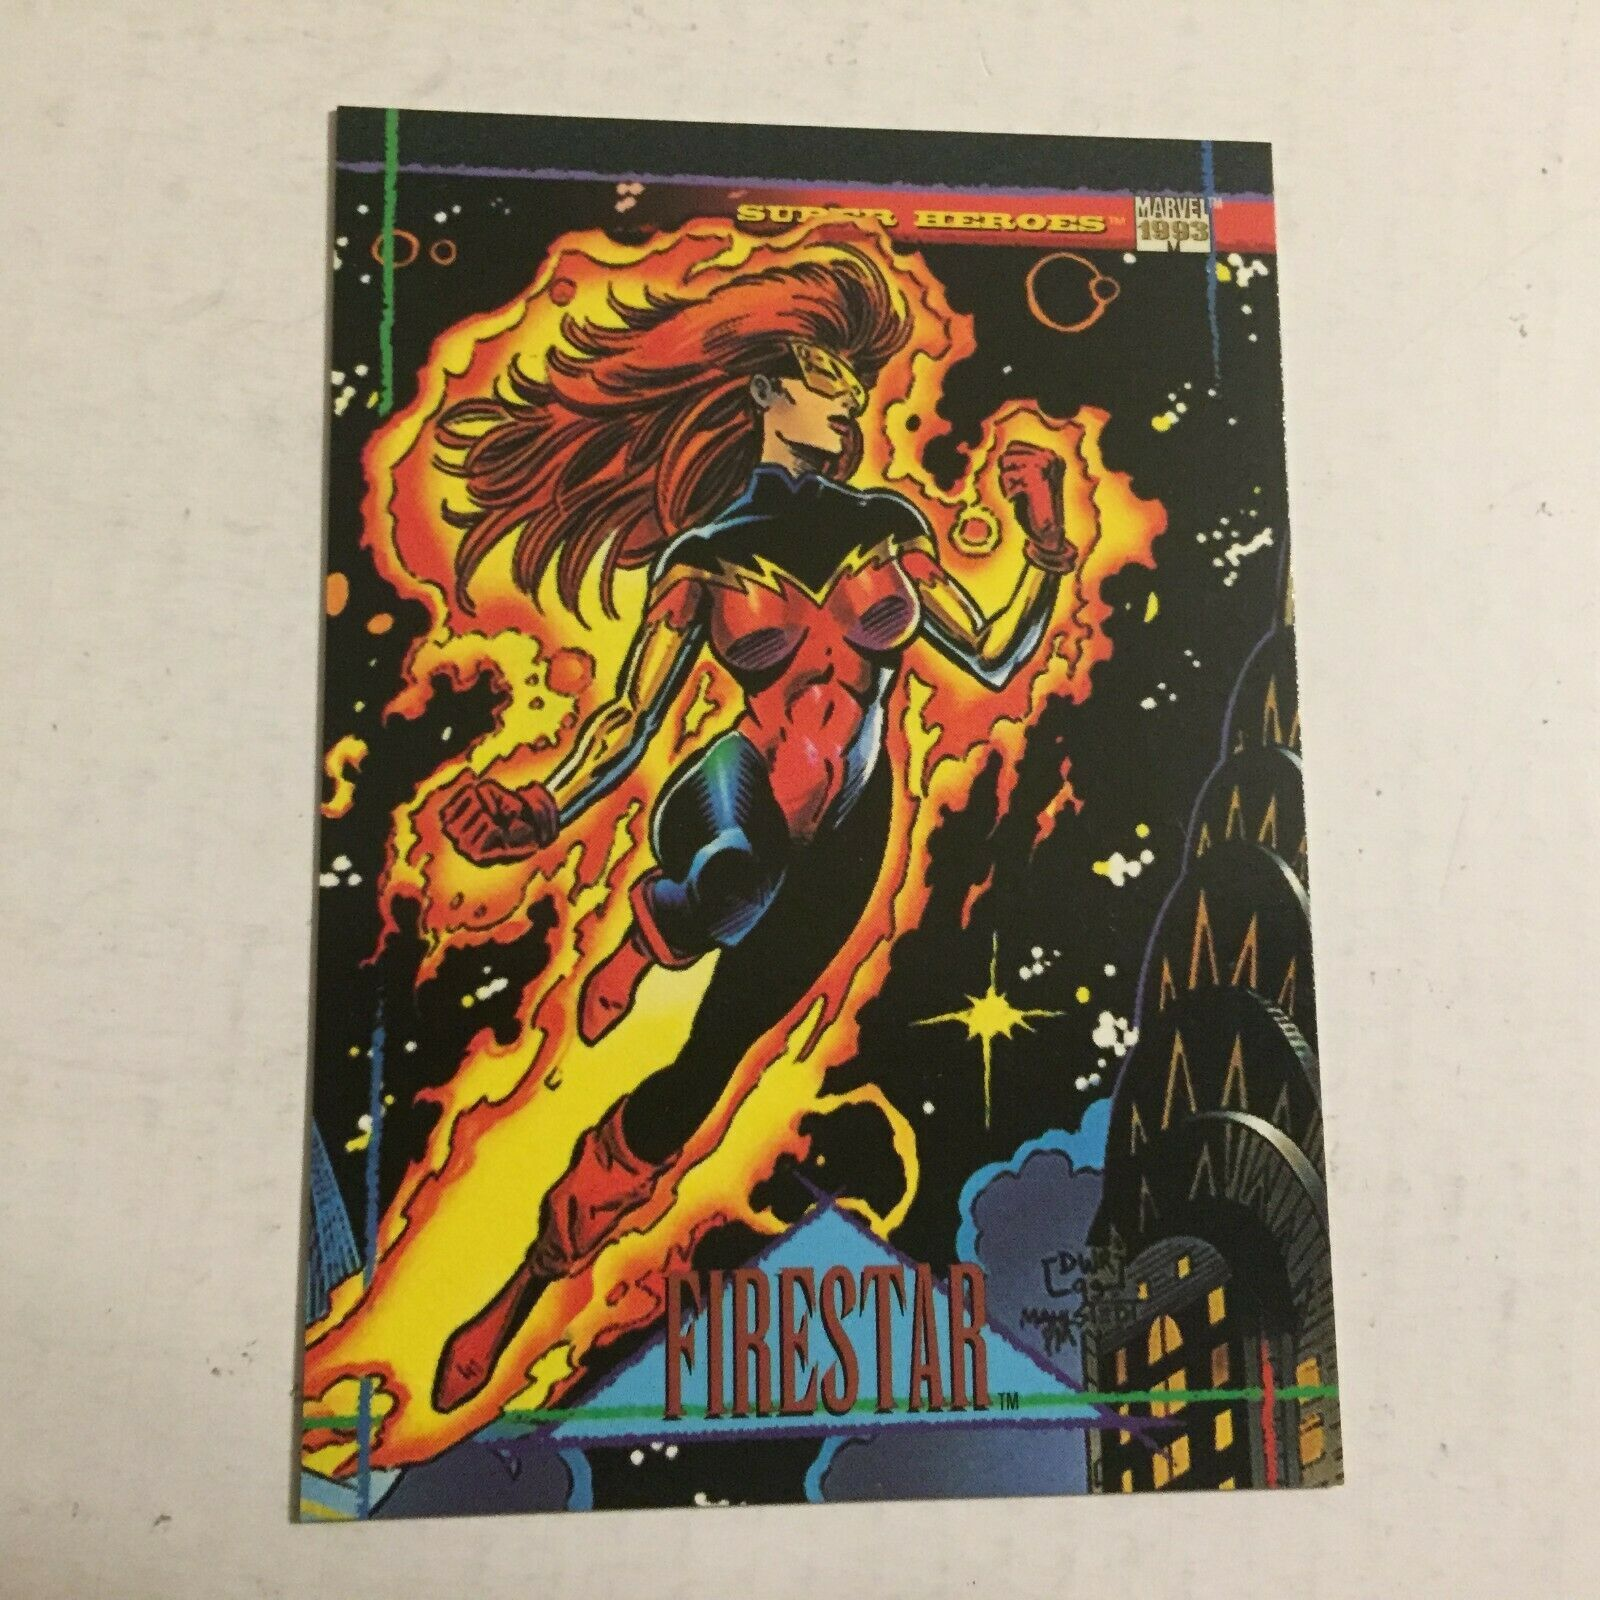 1993 Firestar Super Heroes Marvel Comics Trading Card - $2.99